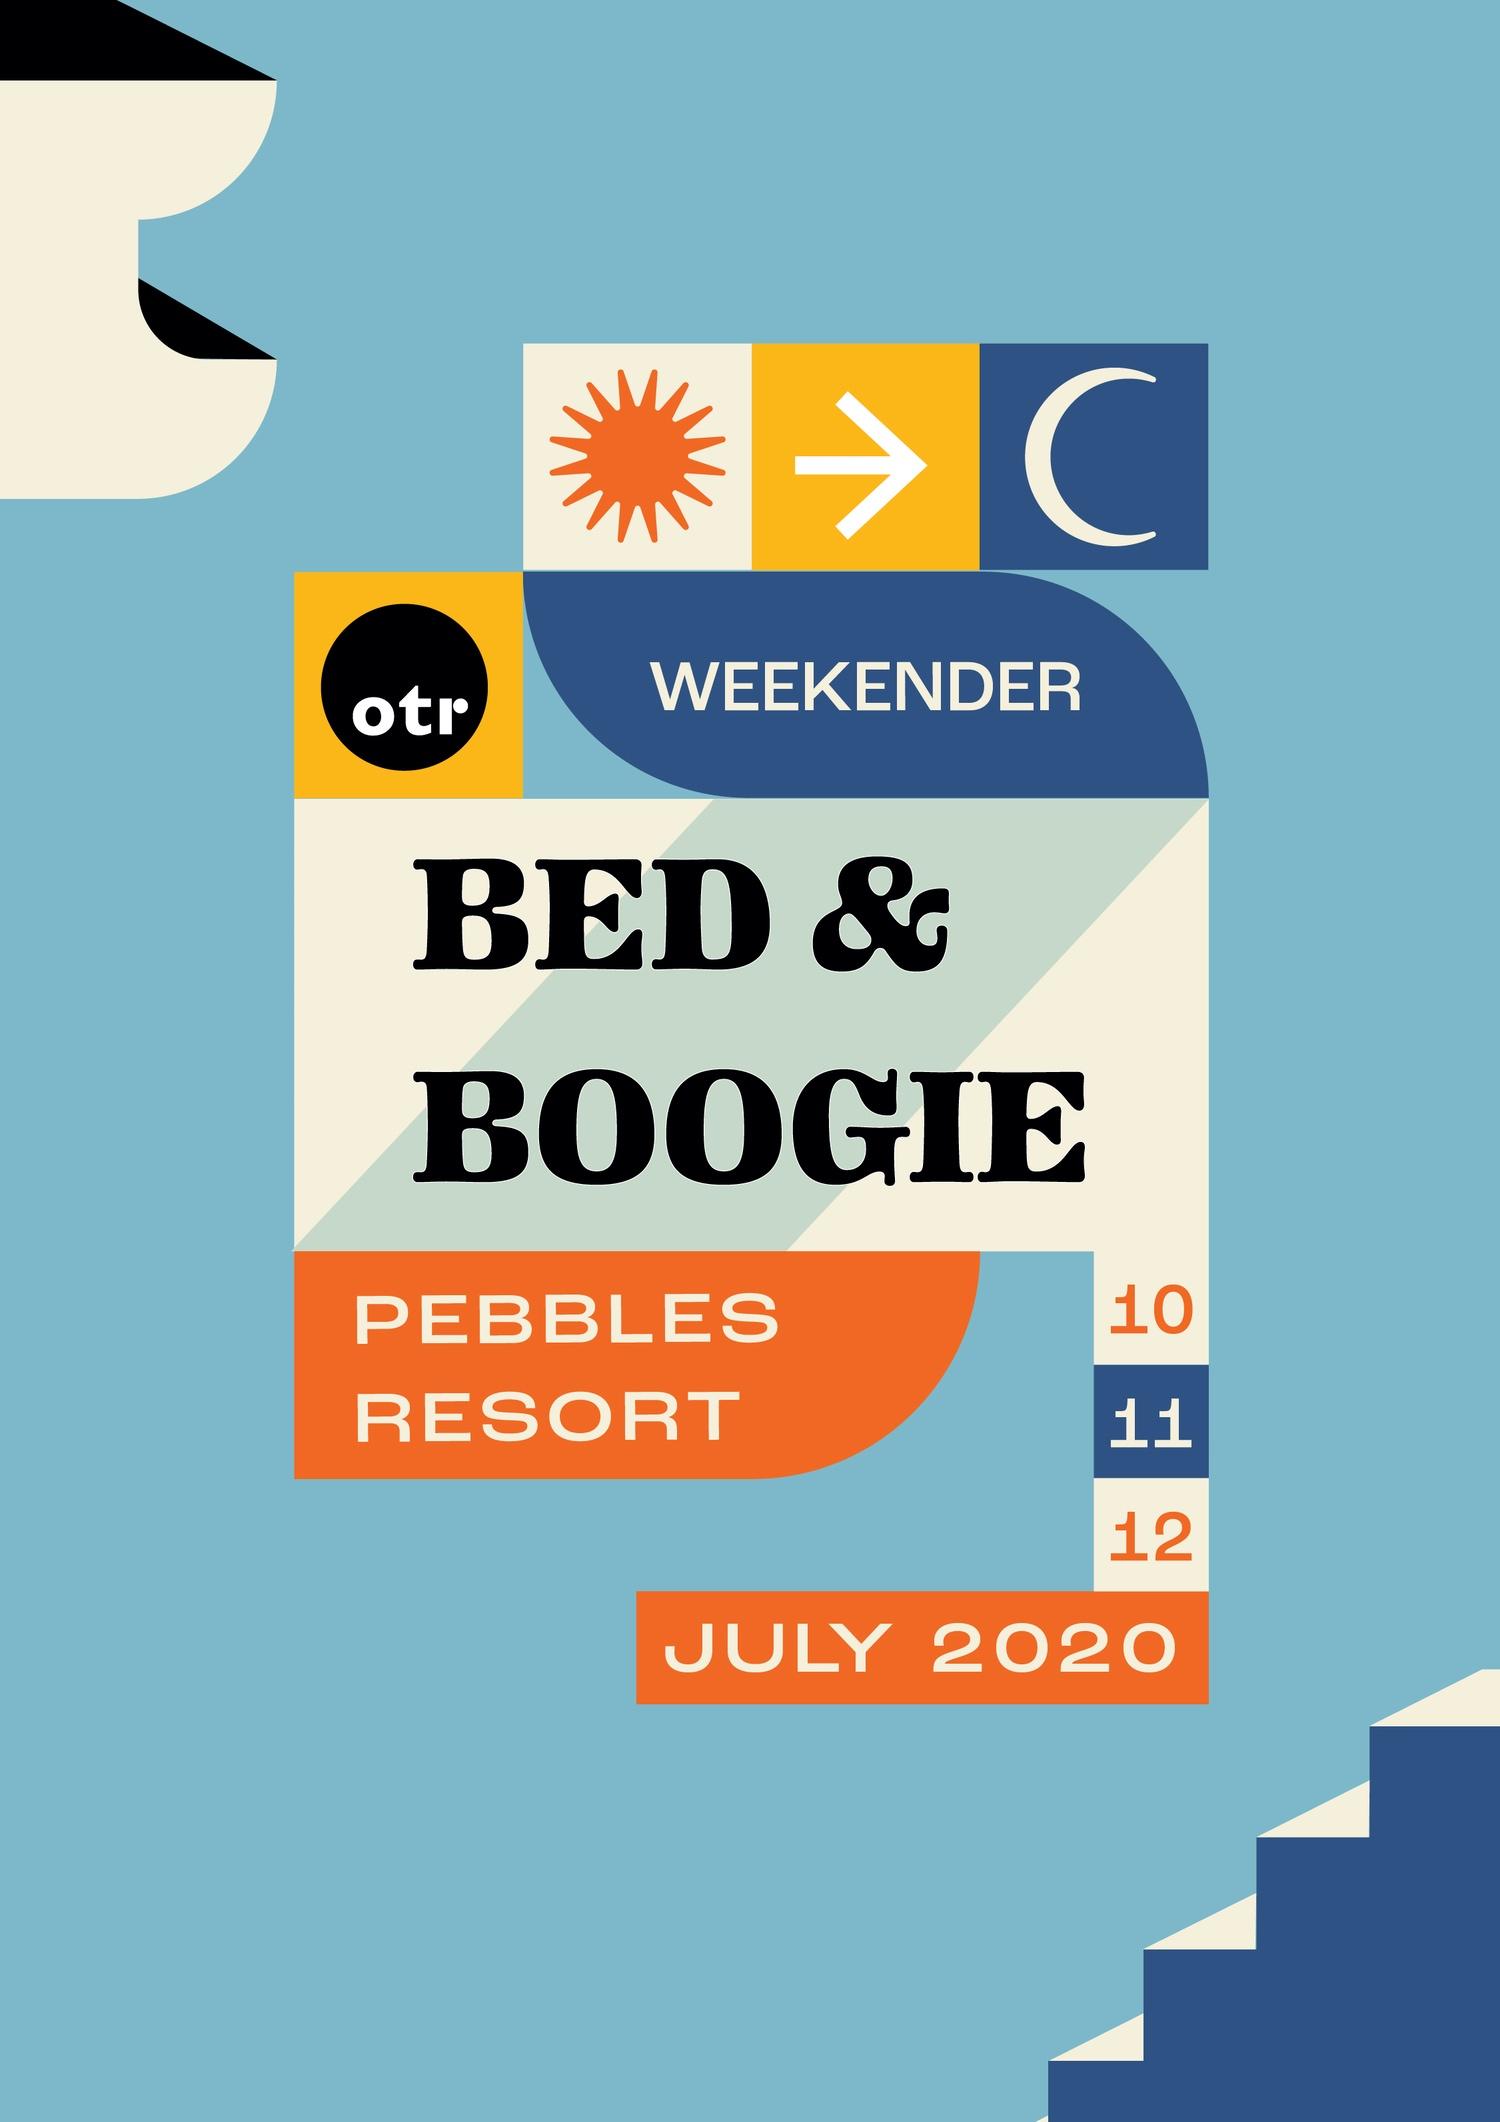 OTR Bed & Boogie Weekender 2020 flyer